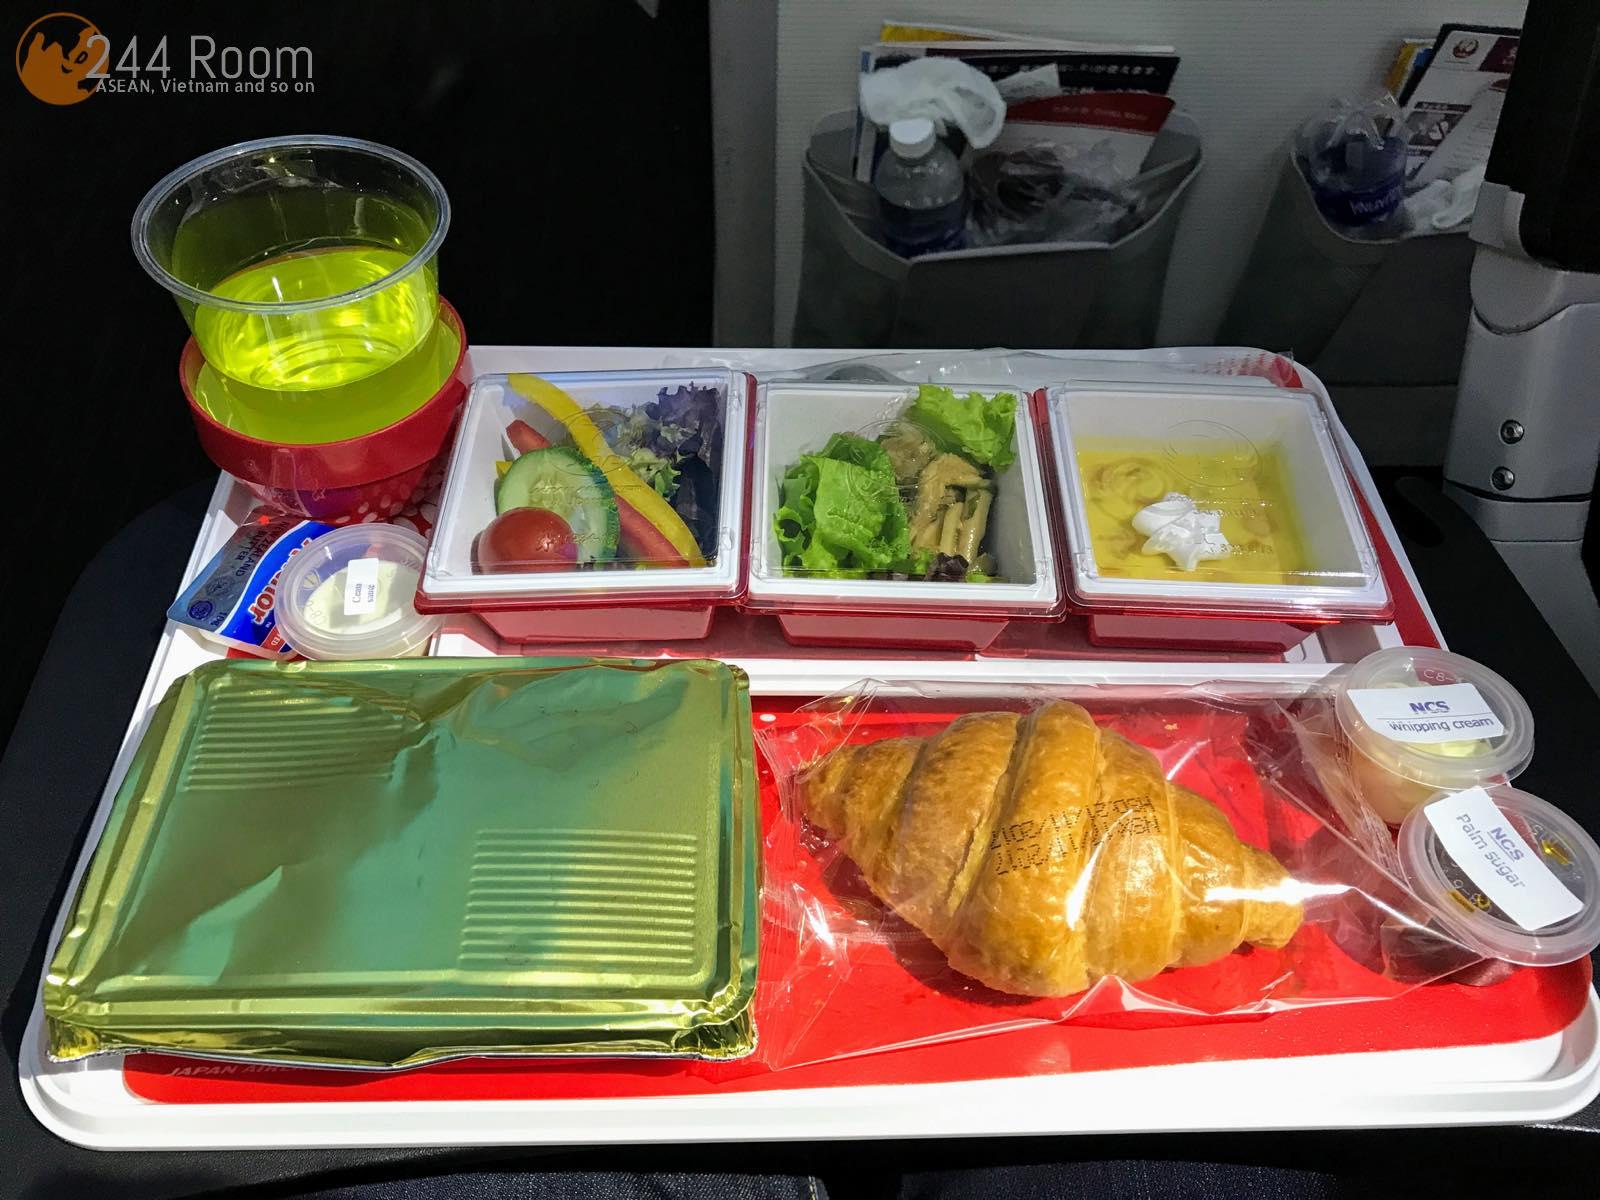 JALエコノミークラス機内食 JAL Economyclass-flightmeal-jl752